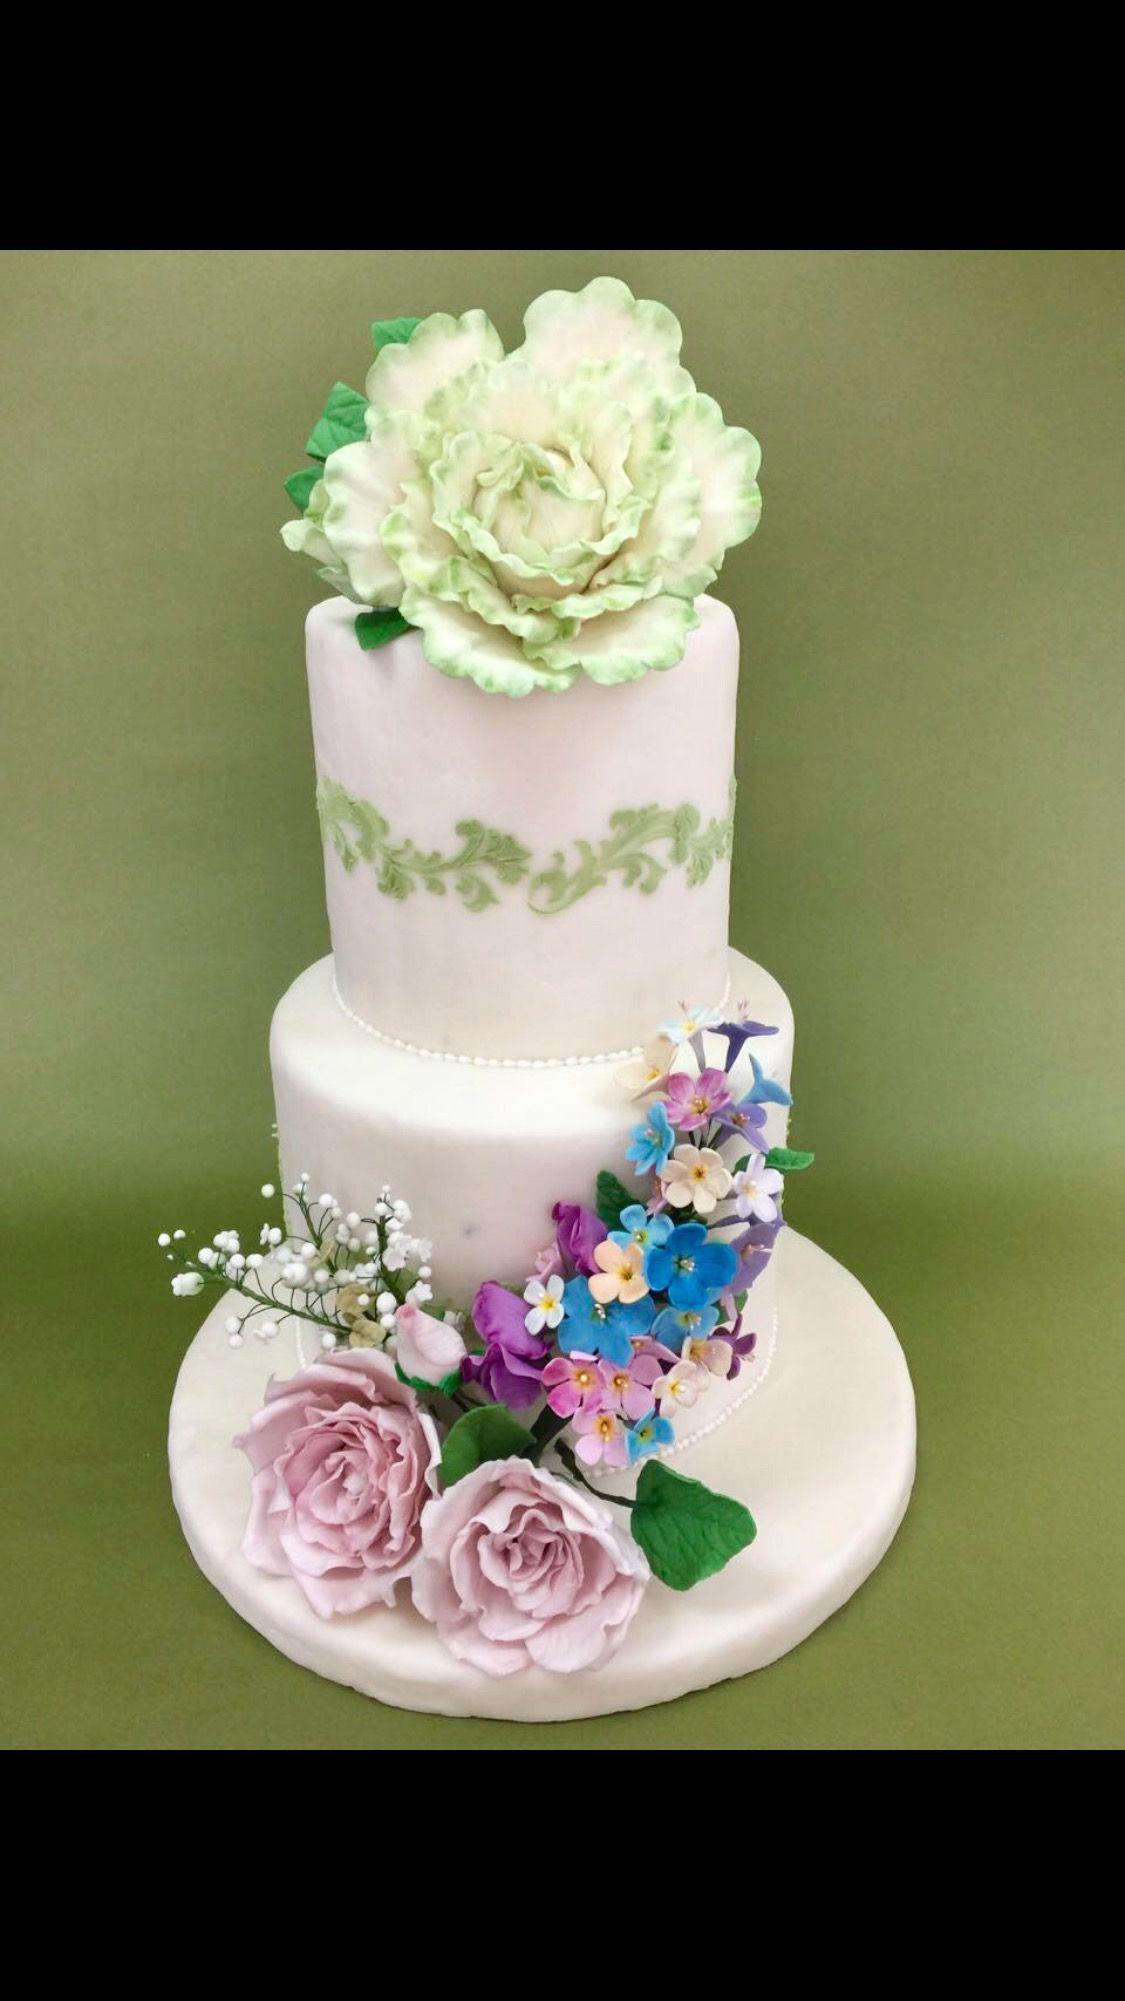 Beautiful Flowers Cake Diplomado En Diseo Y Decoracin De